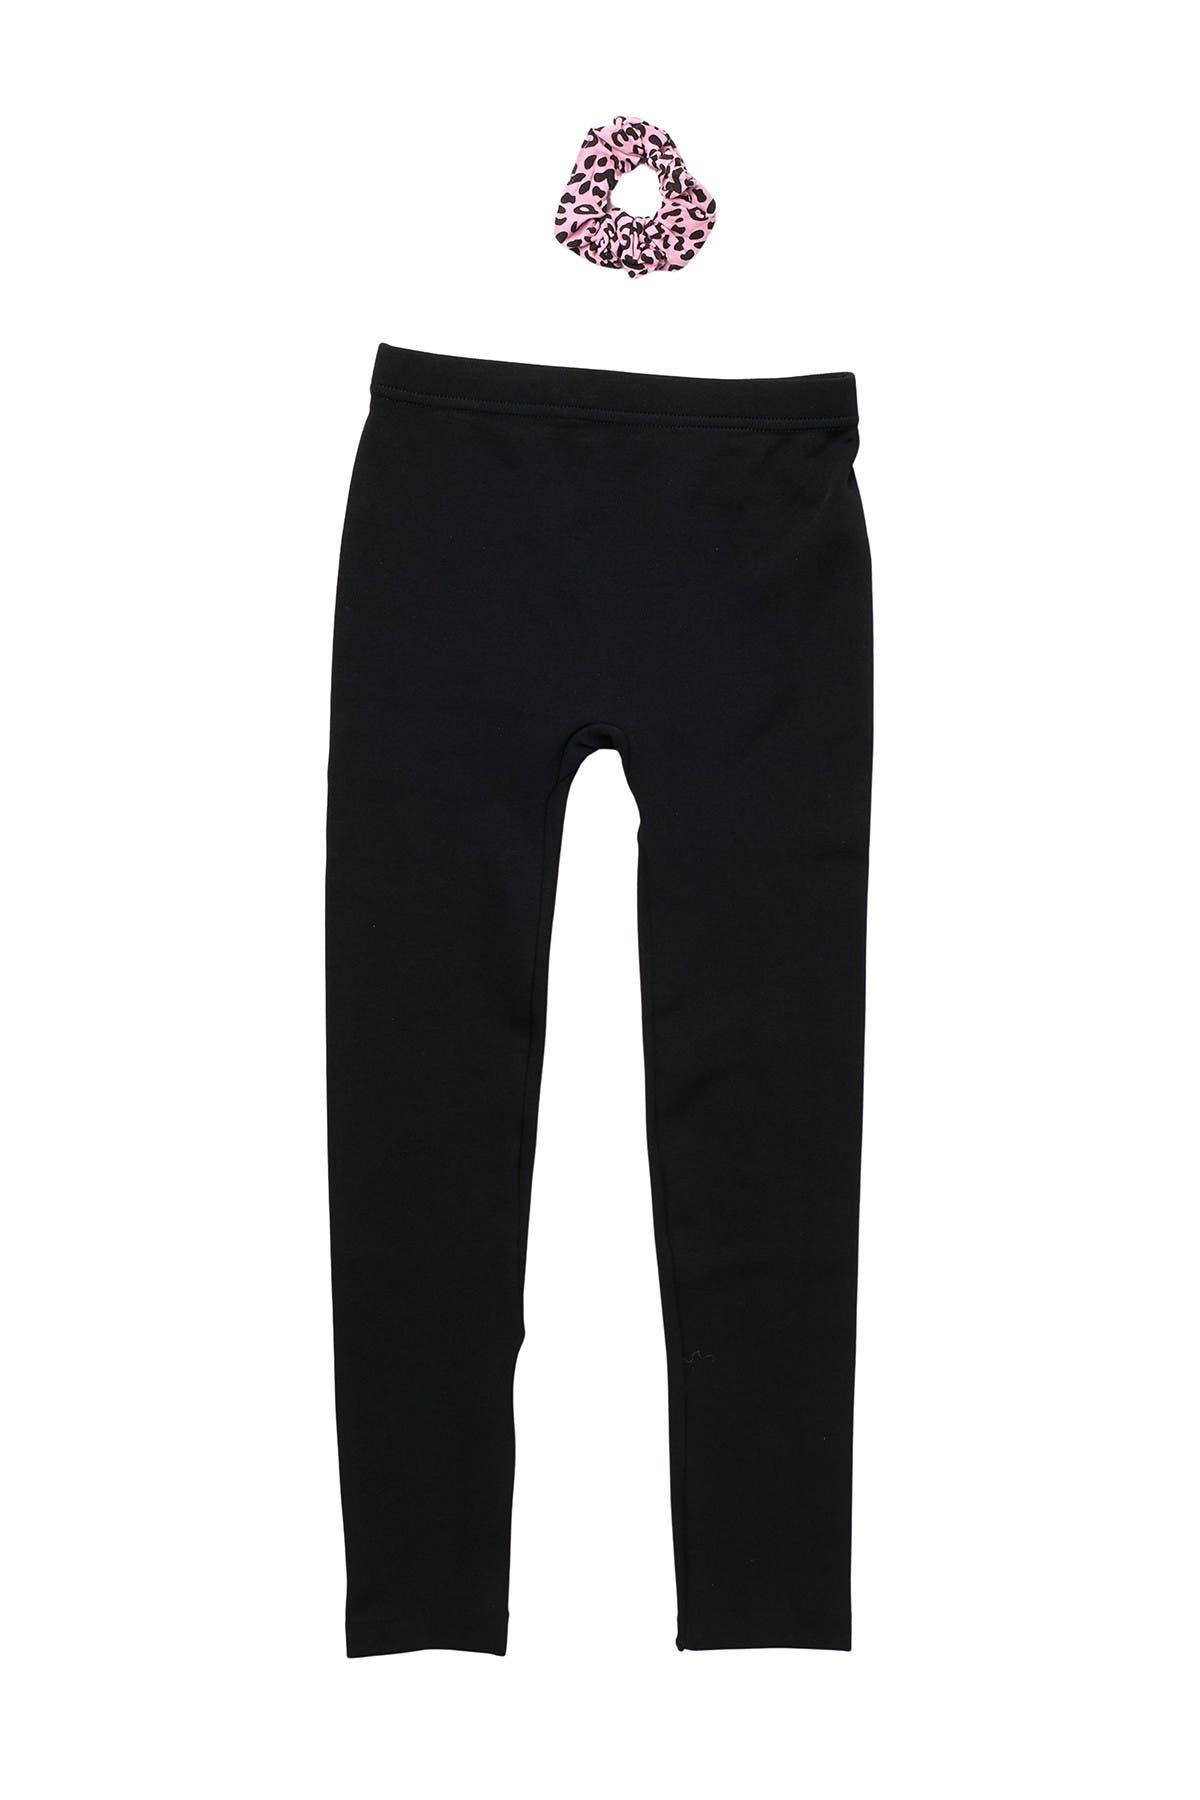 Image of CAPELLI OF NEW YORK Solid Fleece Seamless Leggings & Scrunchie